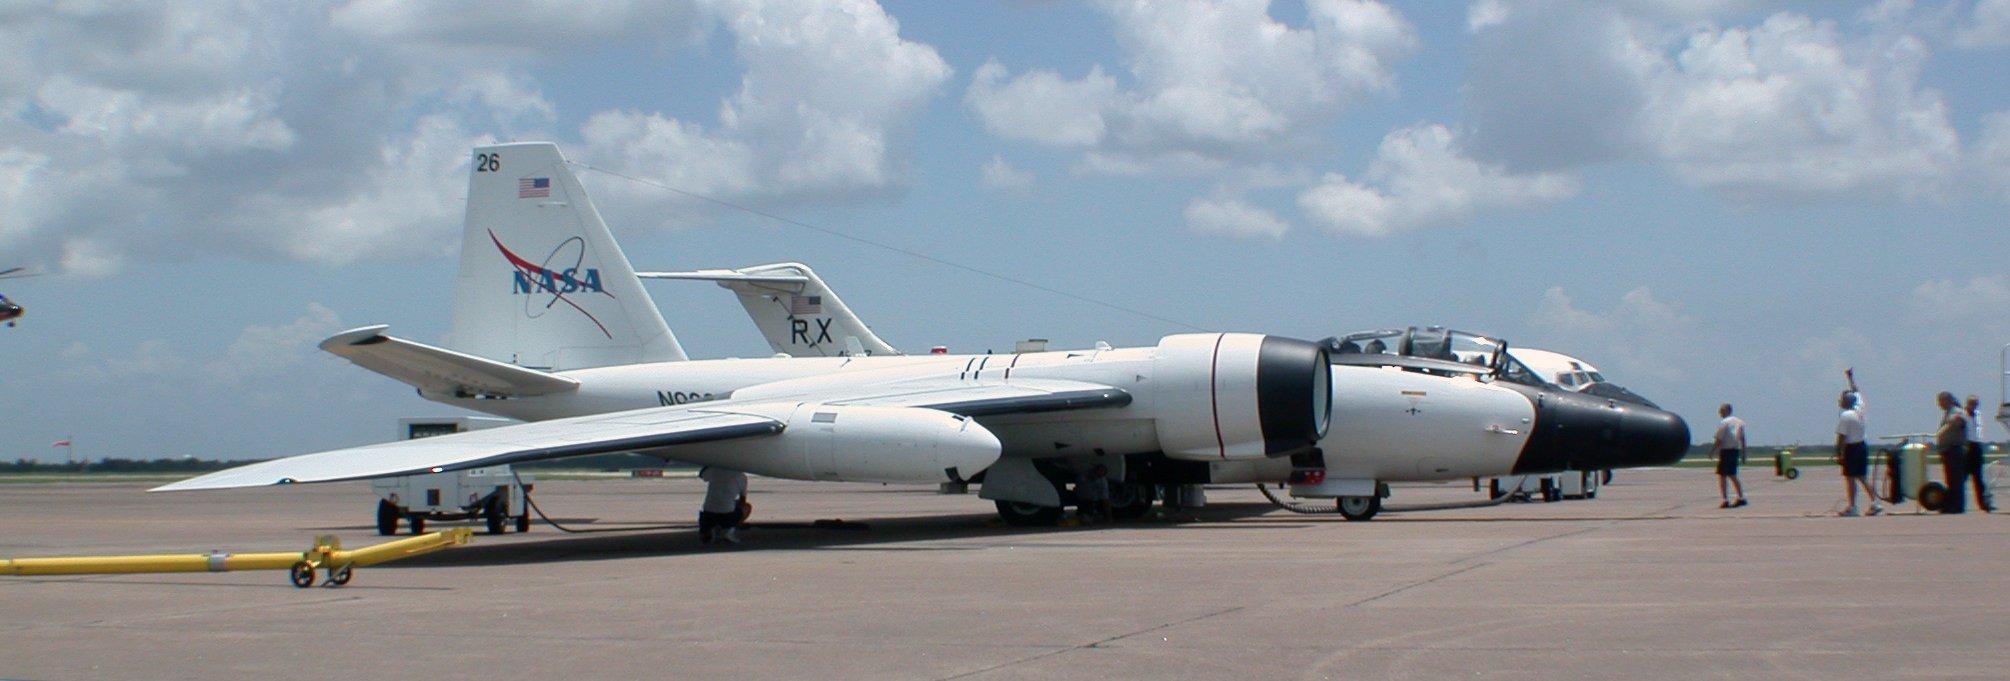 WB-57 Test Flight Ready | ESPO